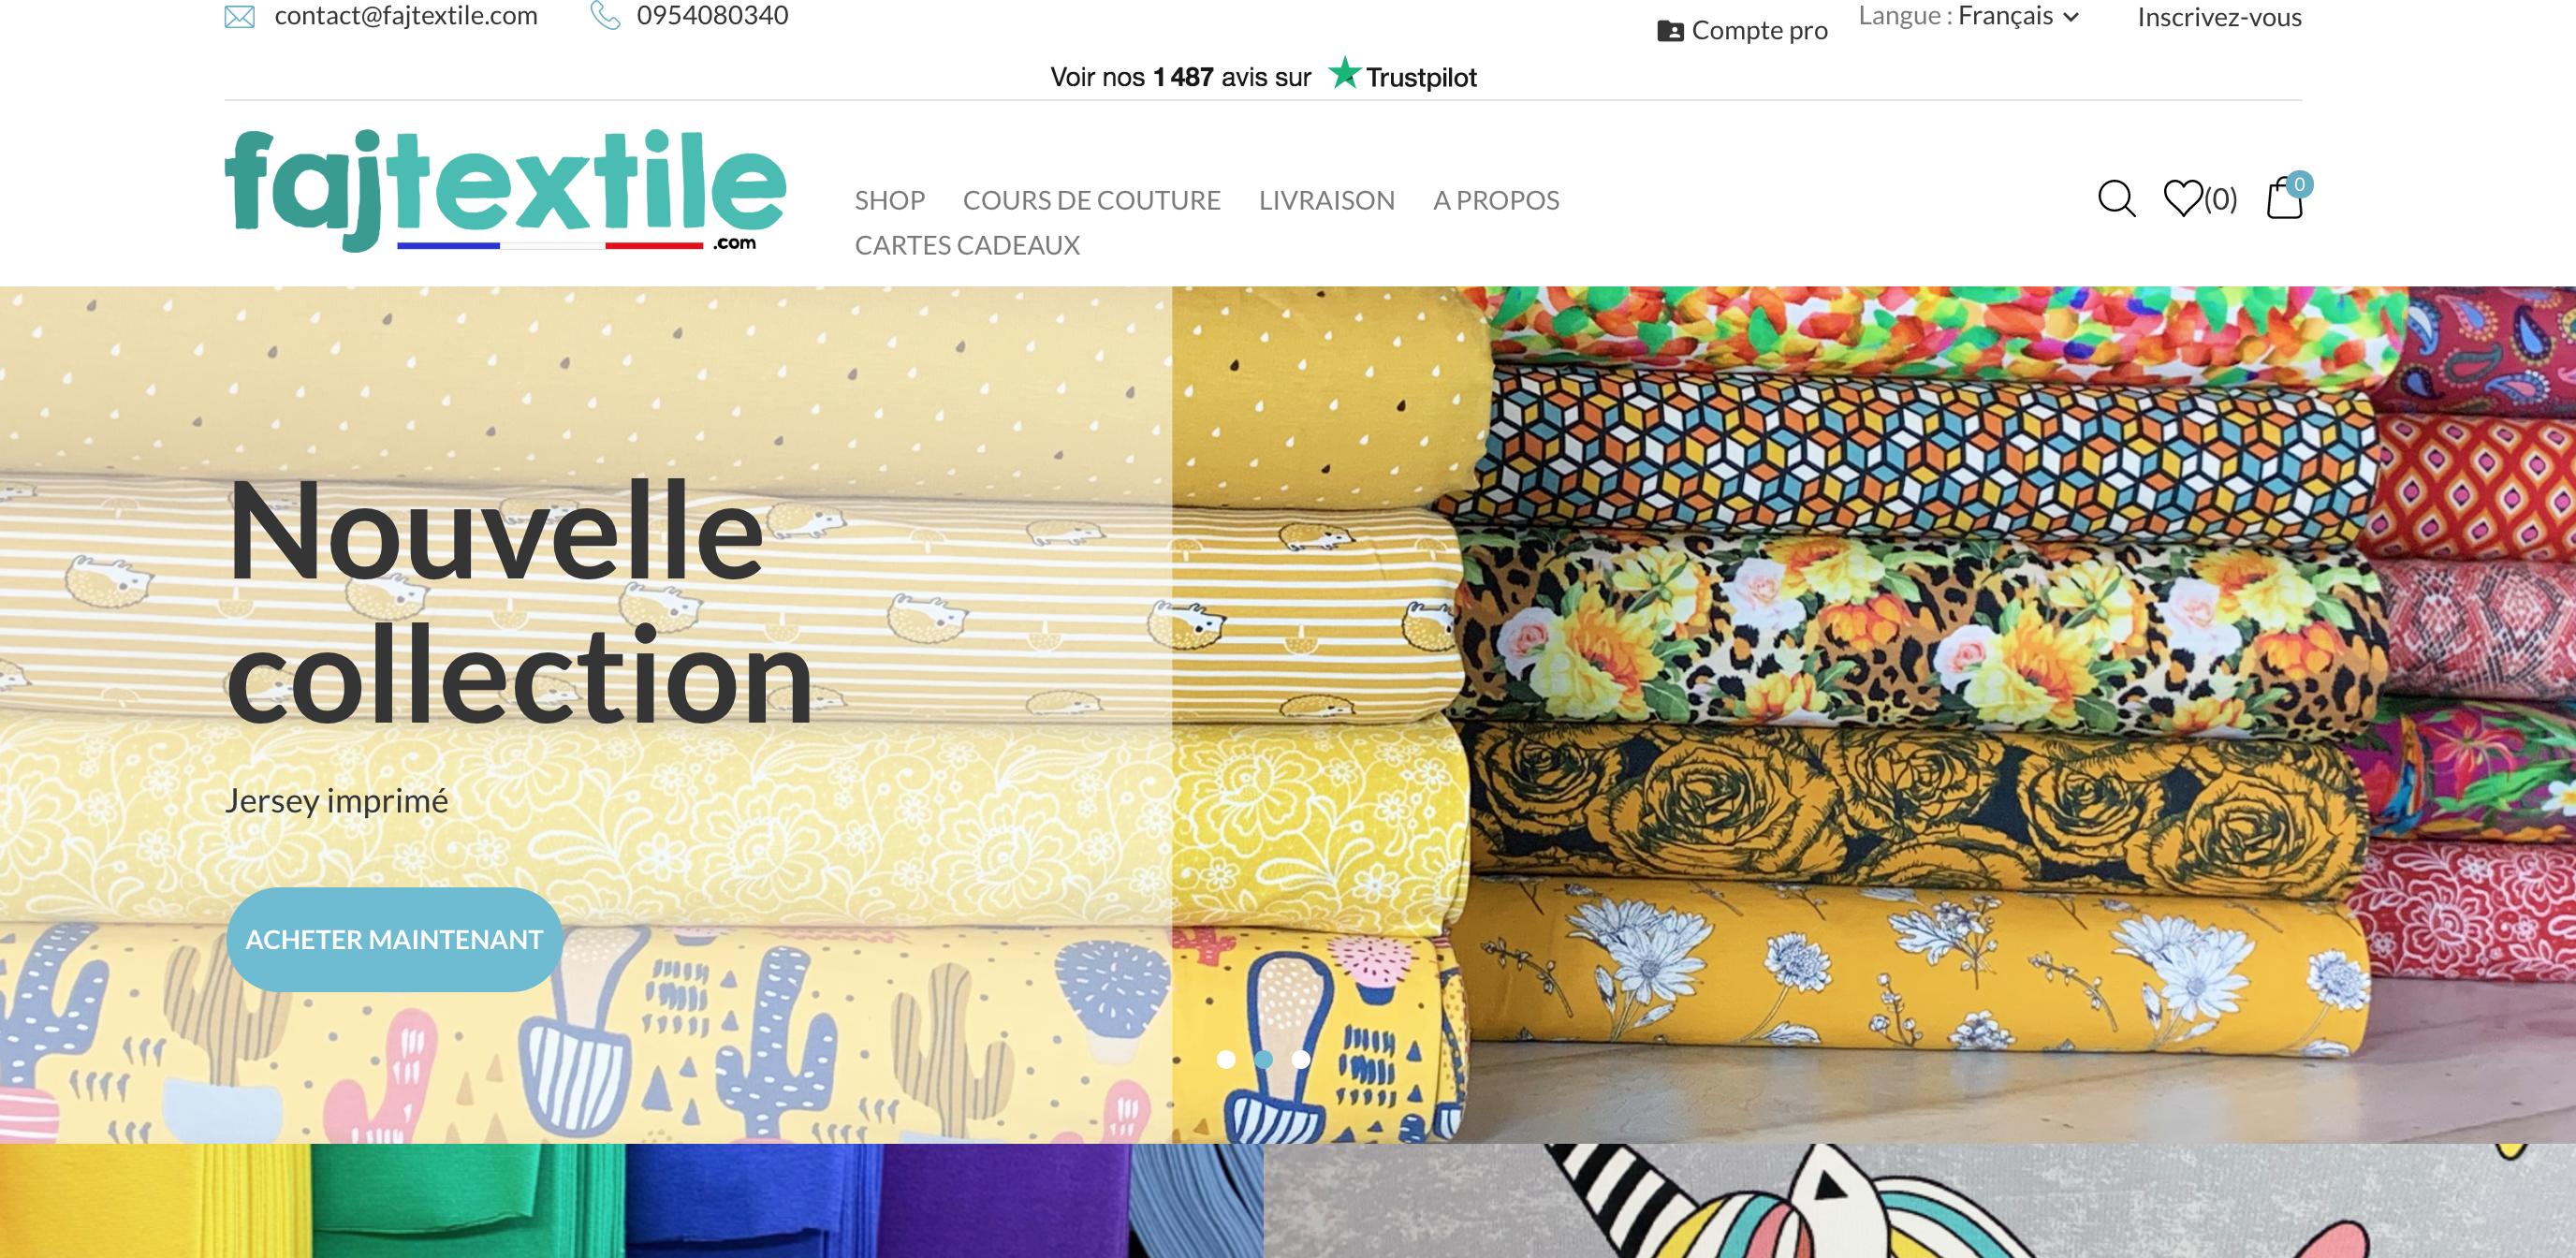 faj textile